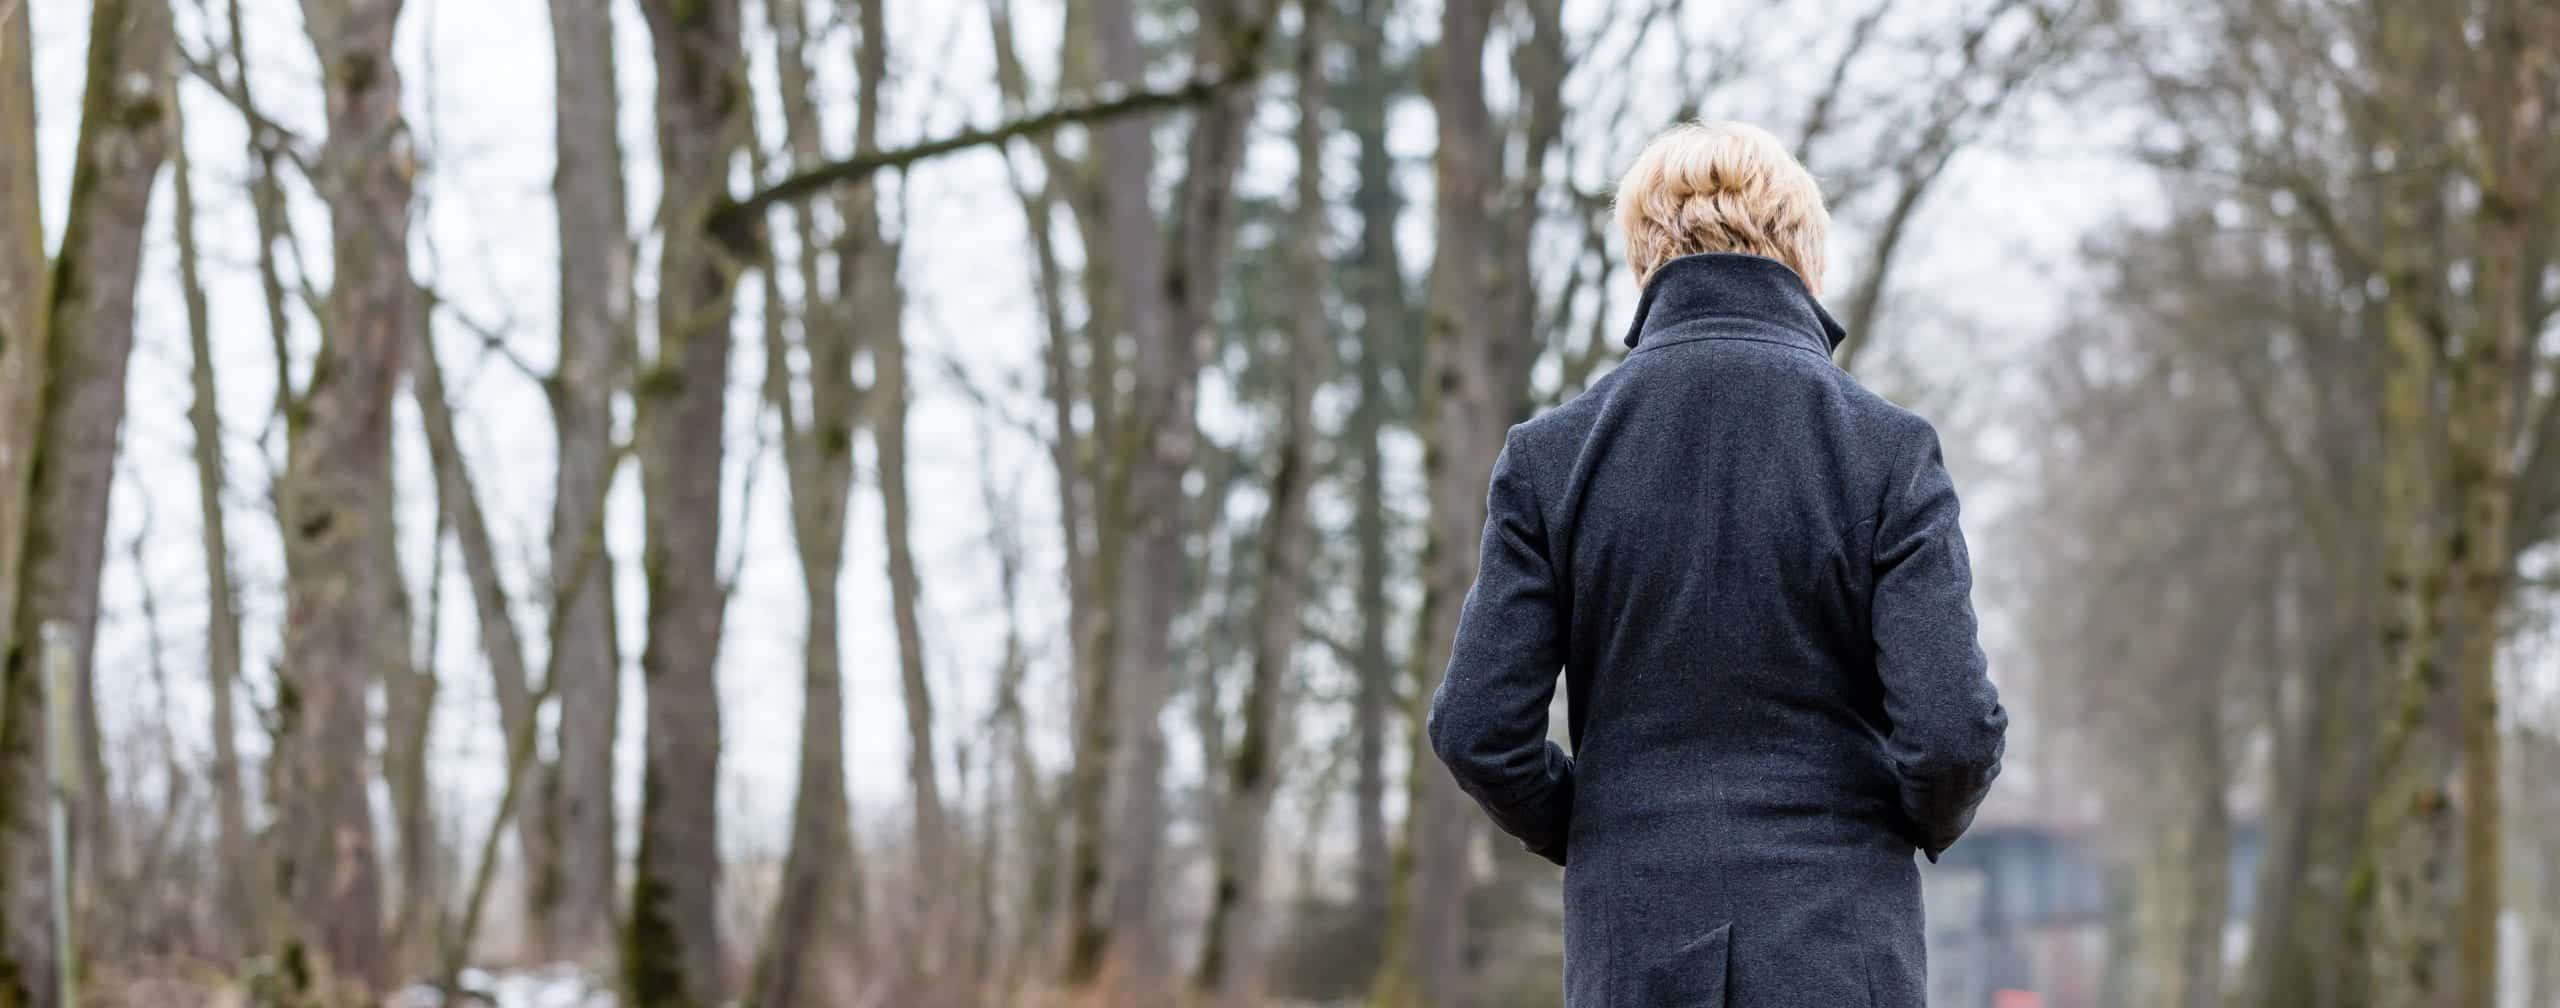 Seasonal affective disorder lack of vitamin D Unhappy woman having walk in winter